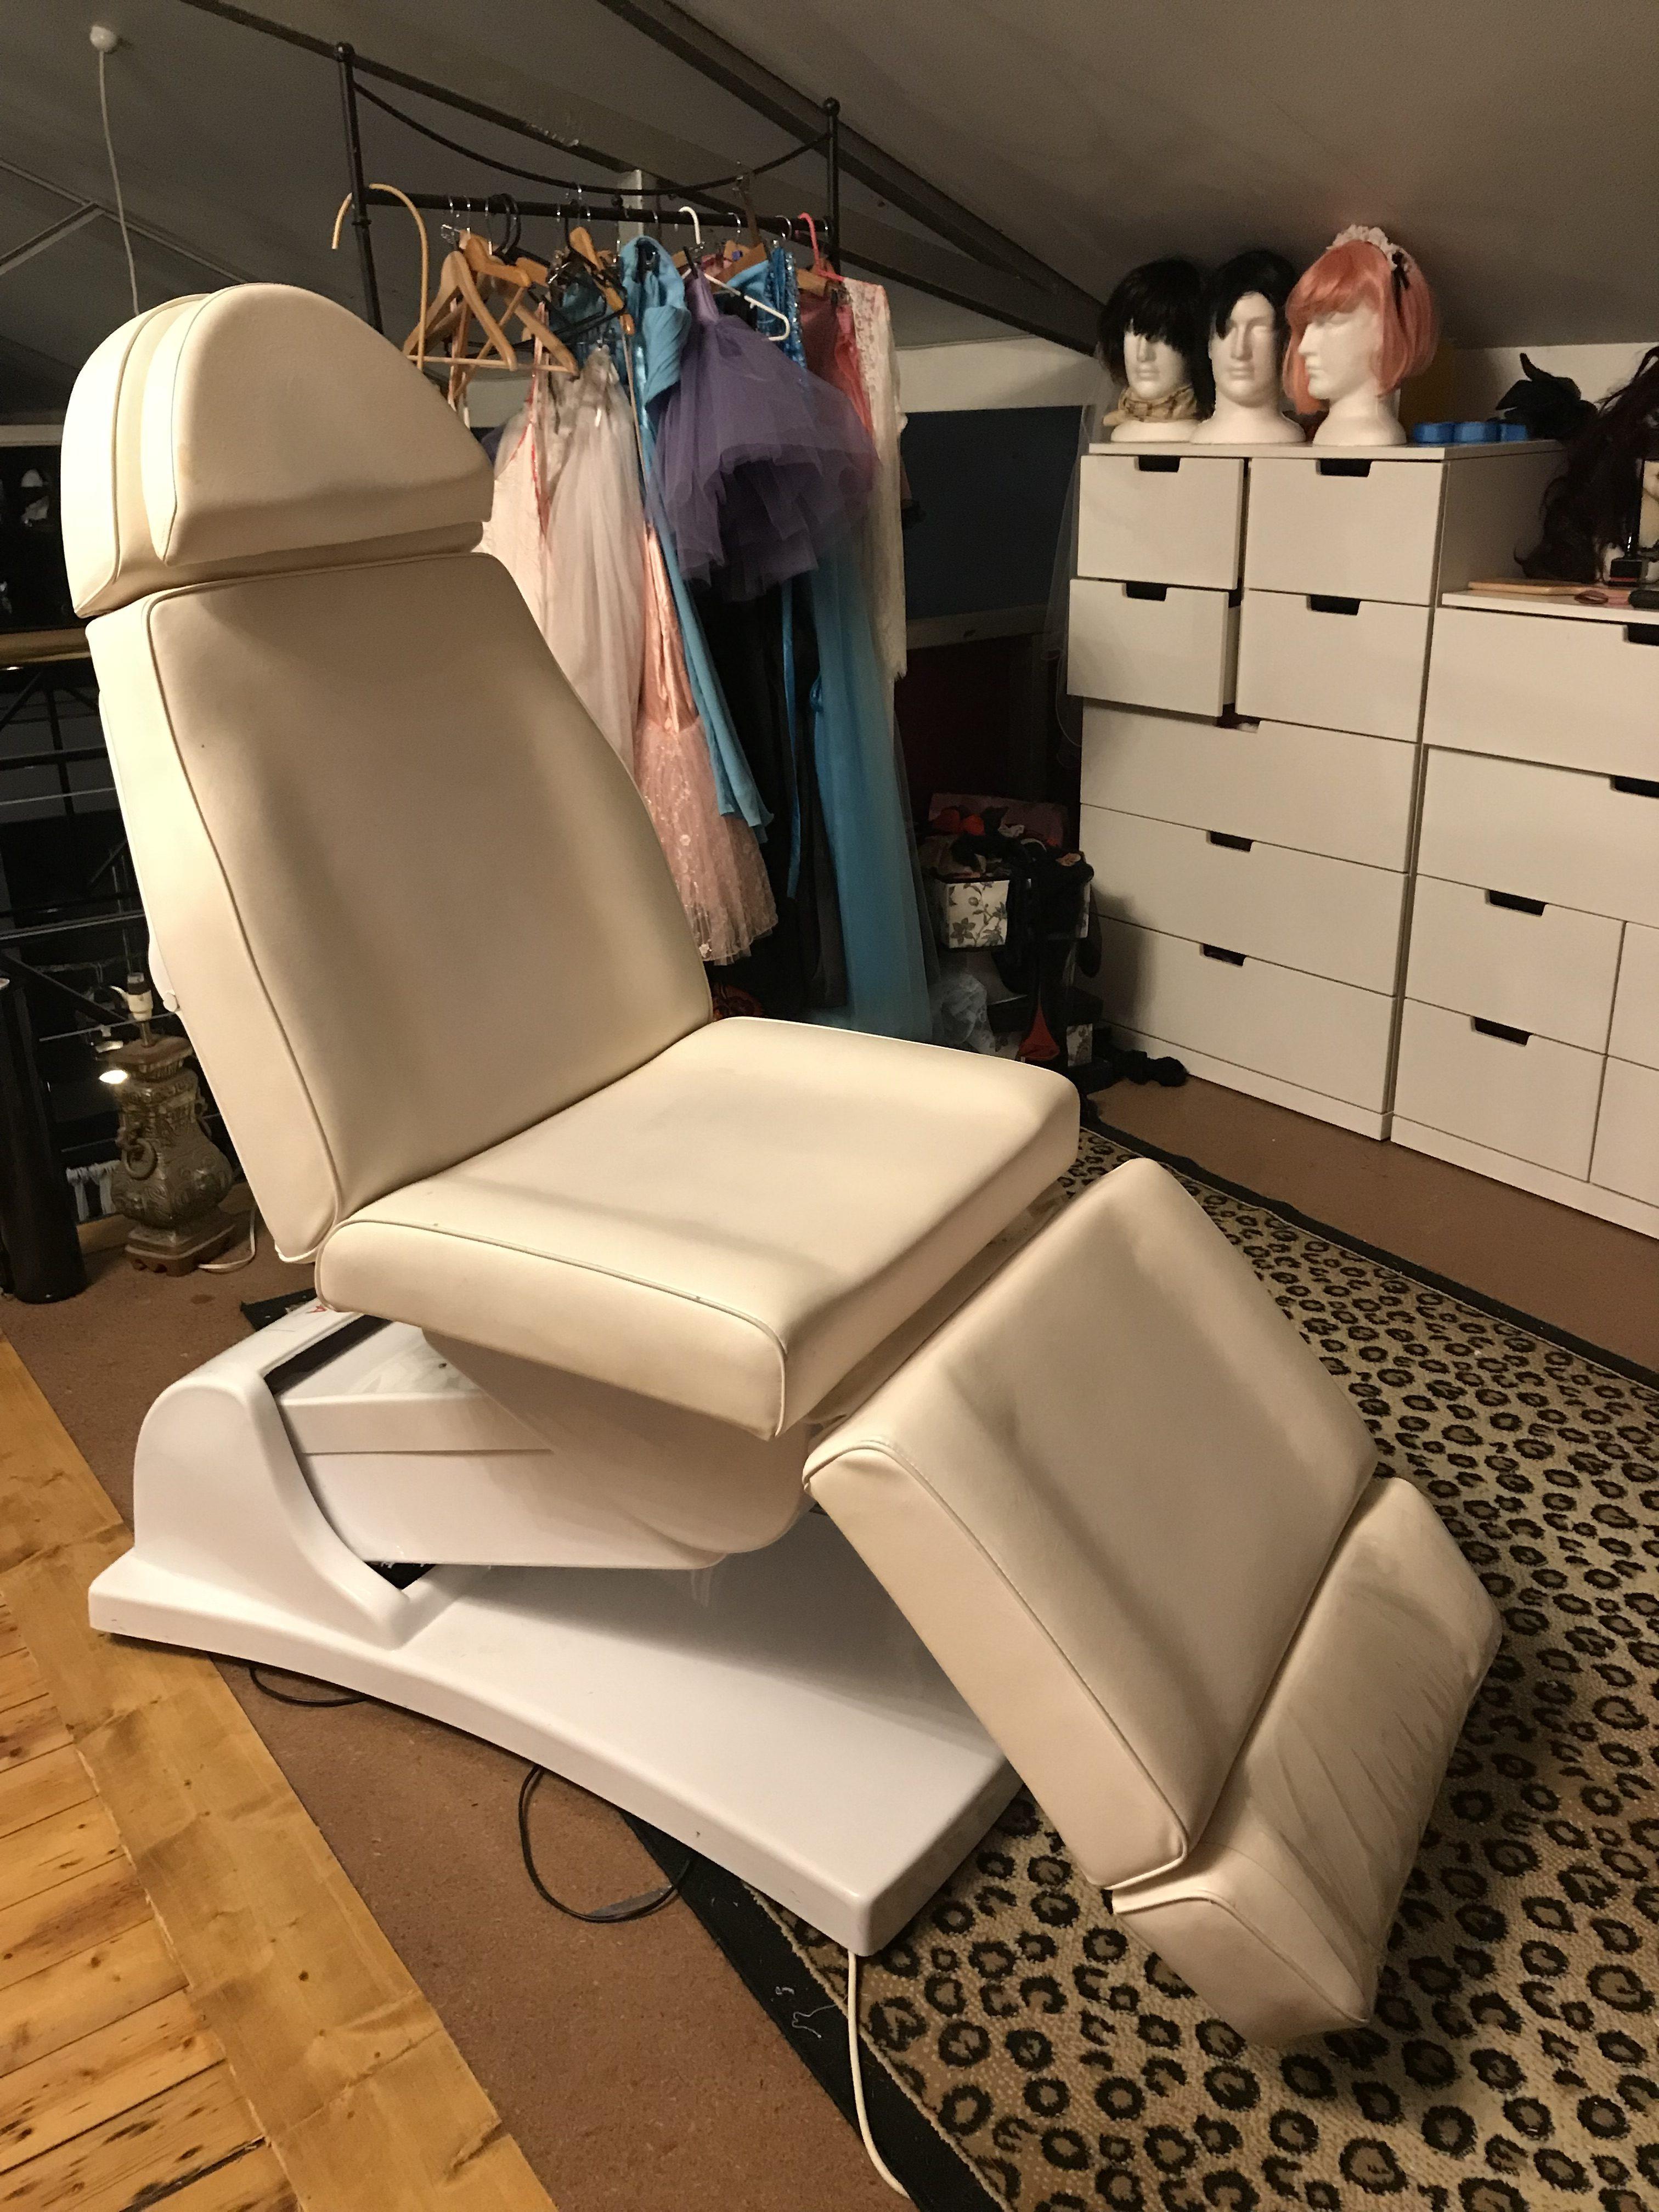 New Bondage Furniture